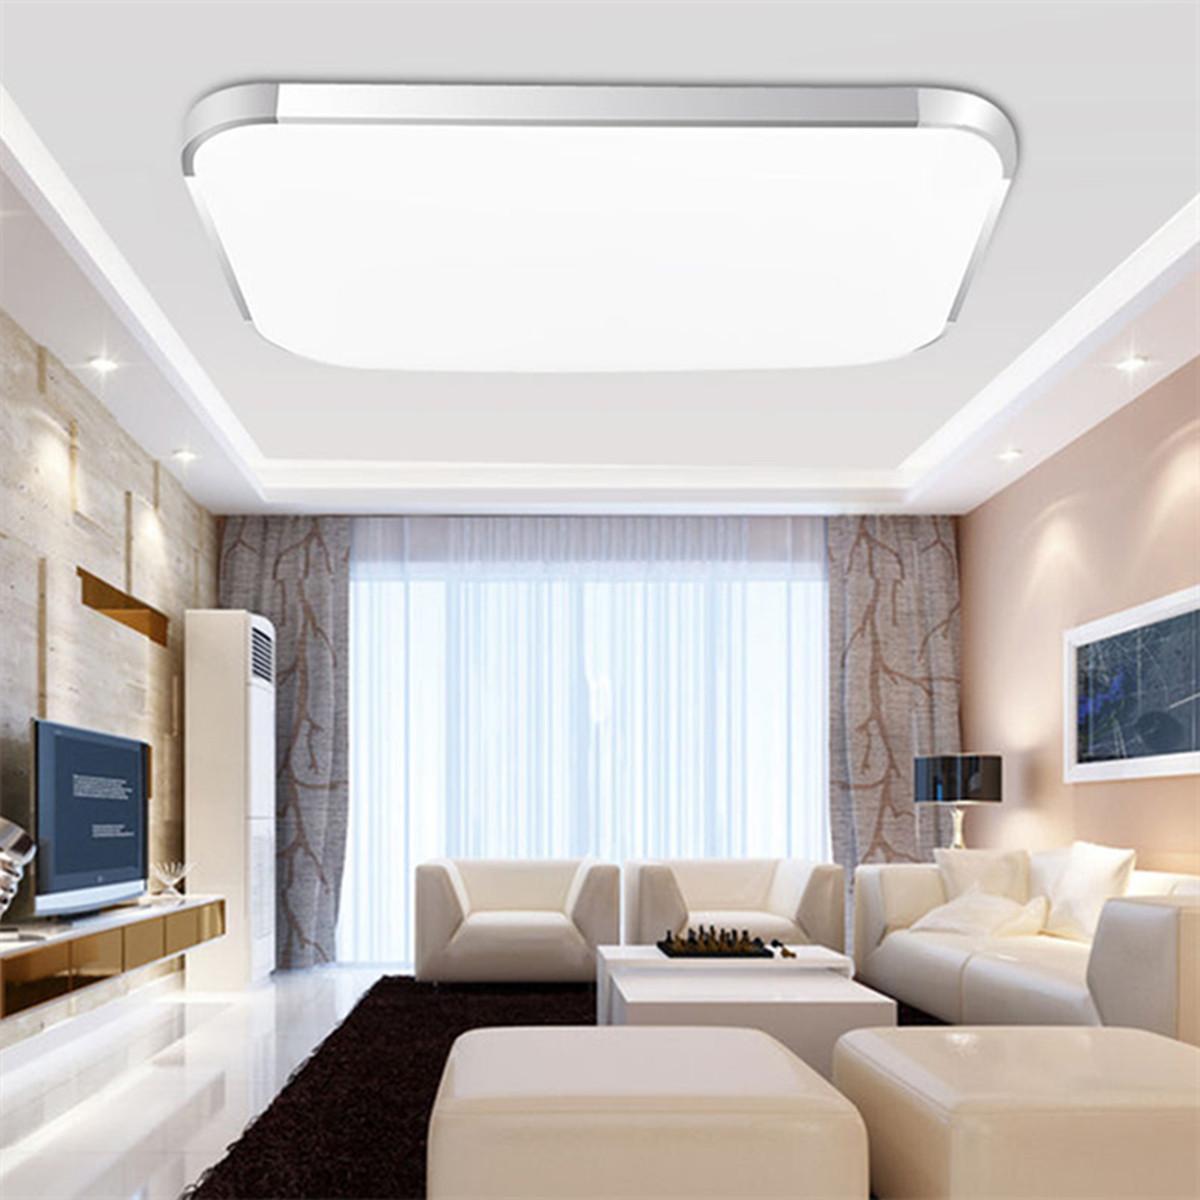 at lighting pure room lights of stunning system living truline in light plaster led